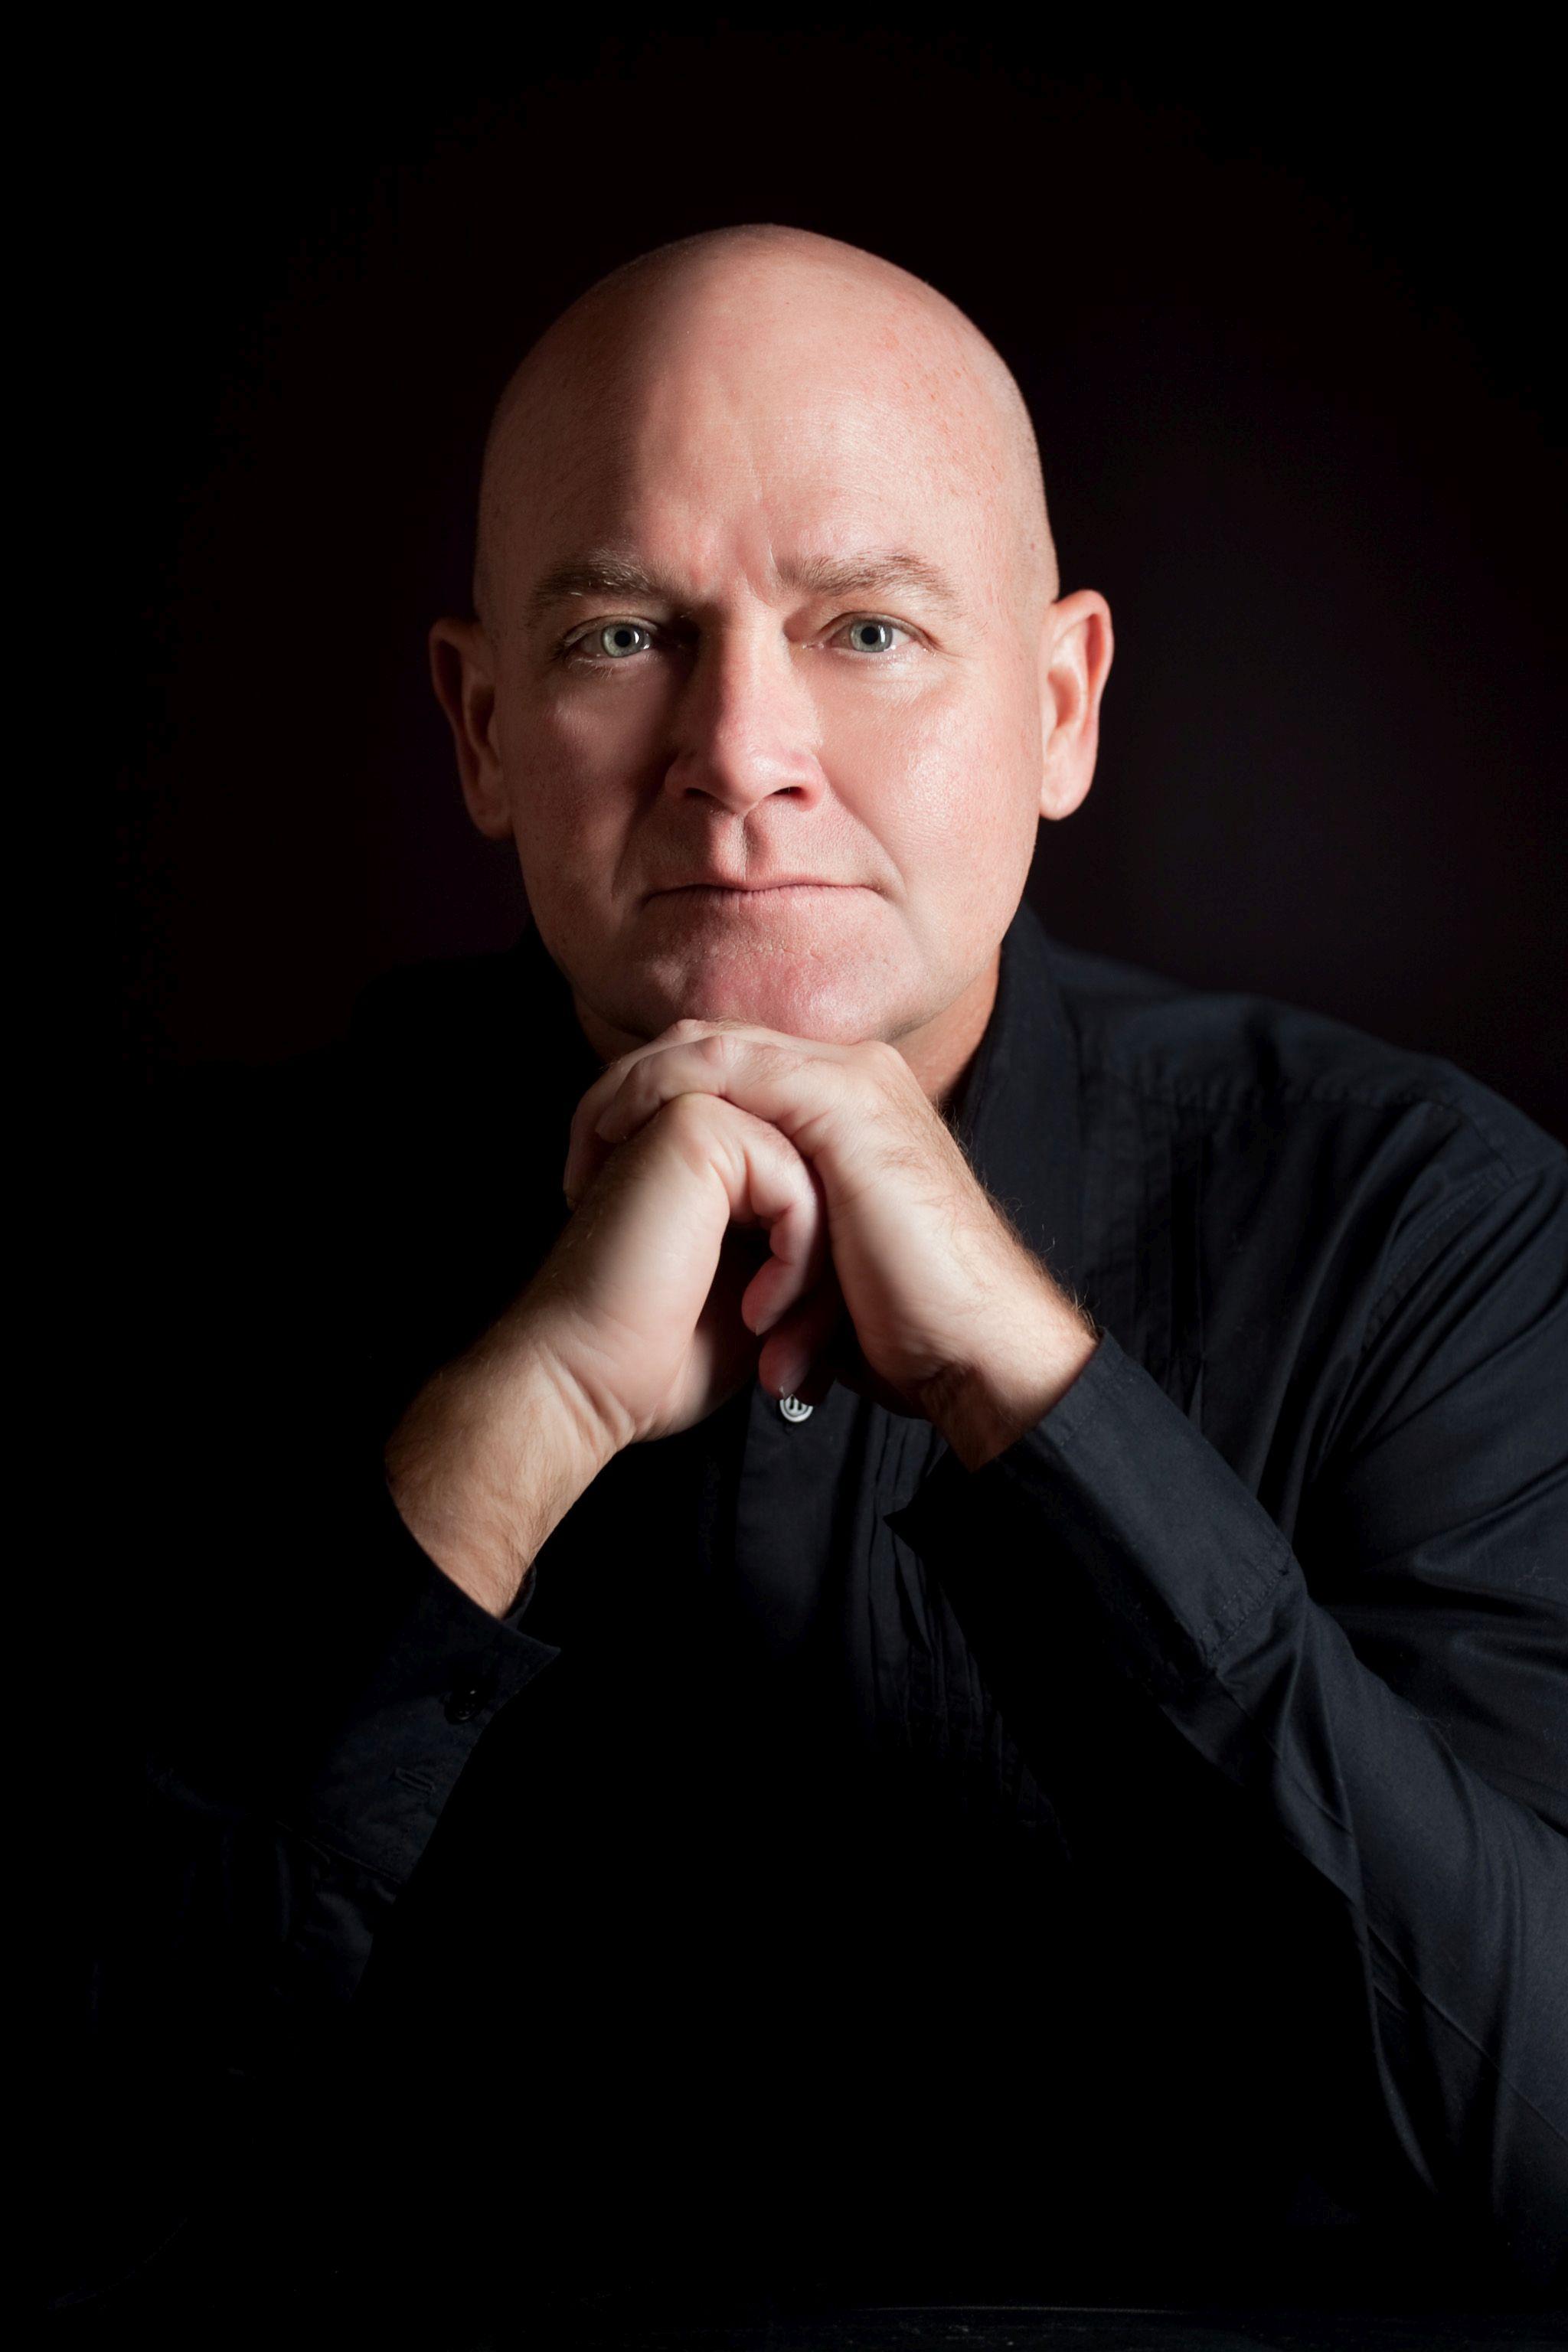 Jeff Mudgett